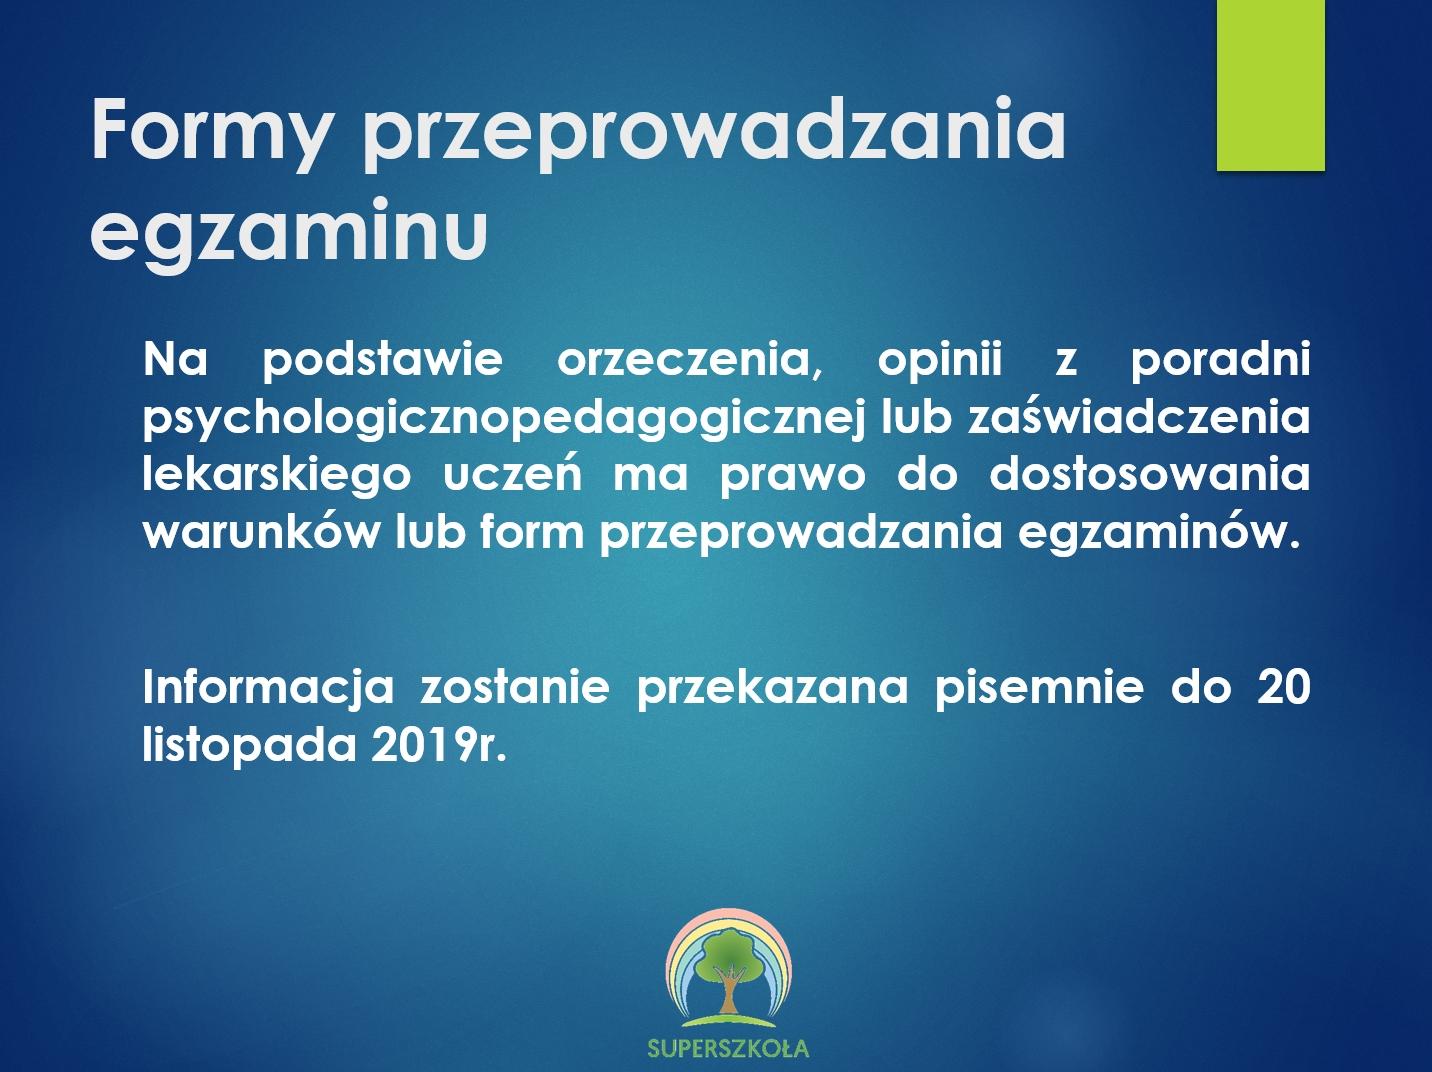 egzamin_osmoklasisty_2020_9